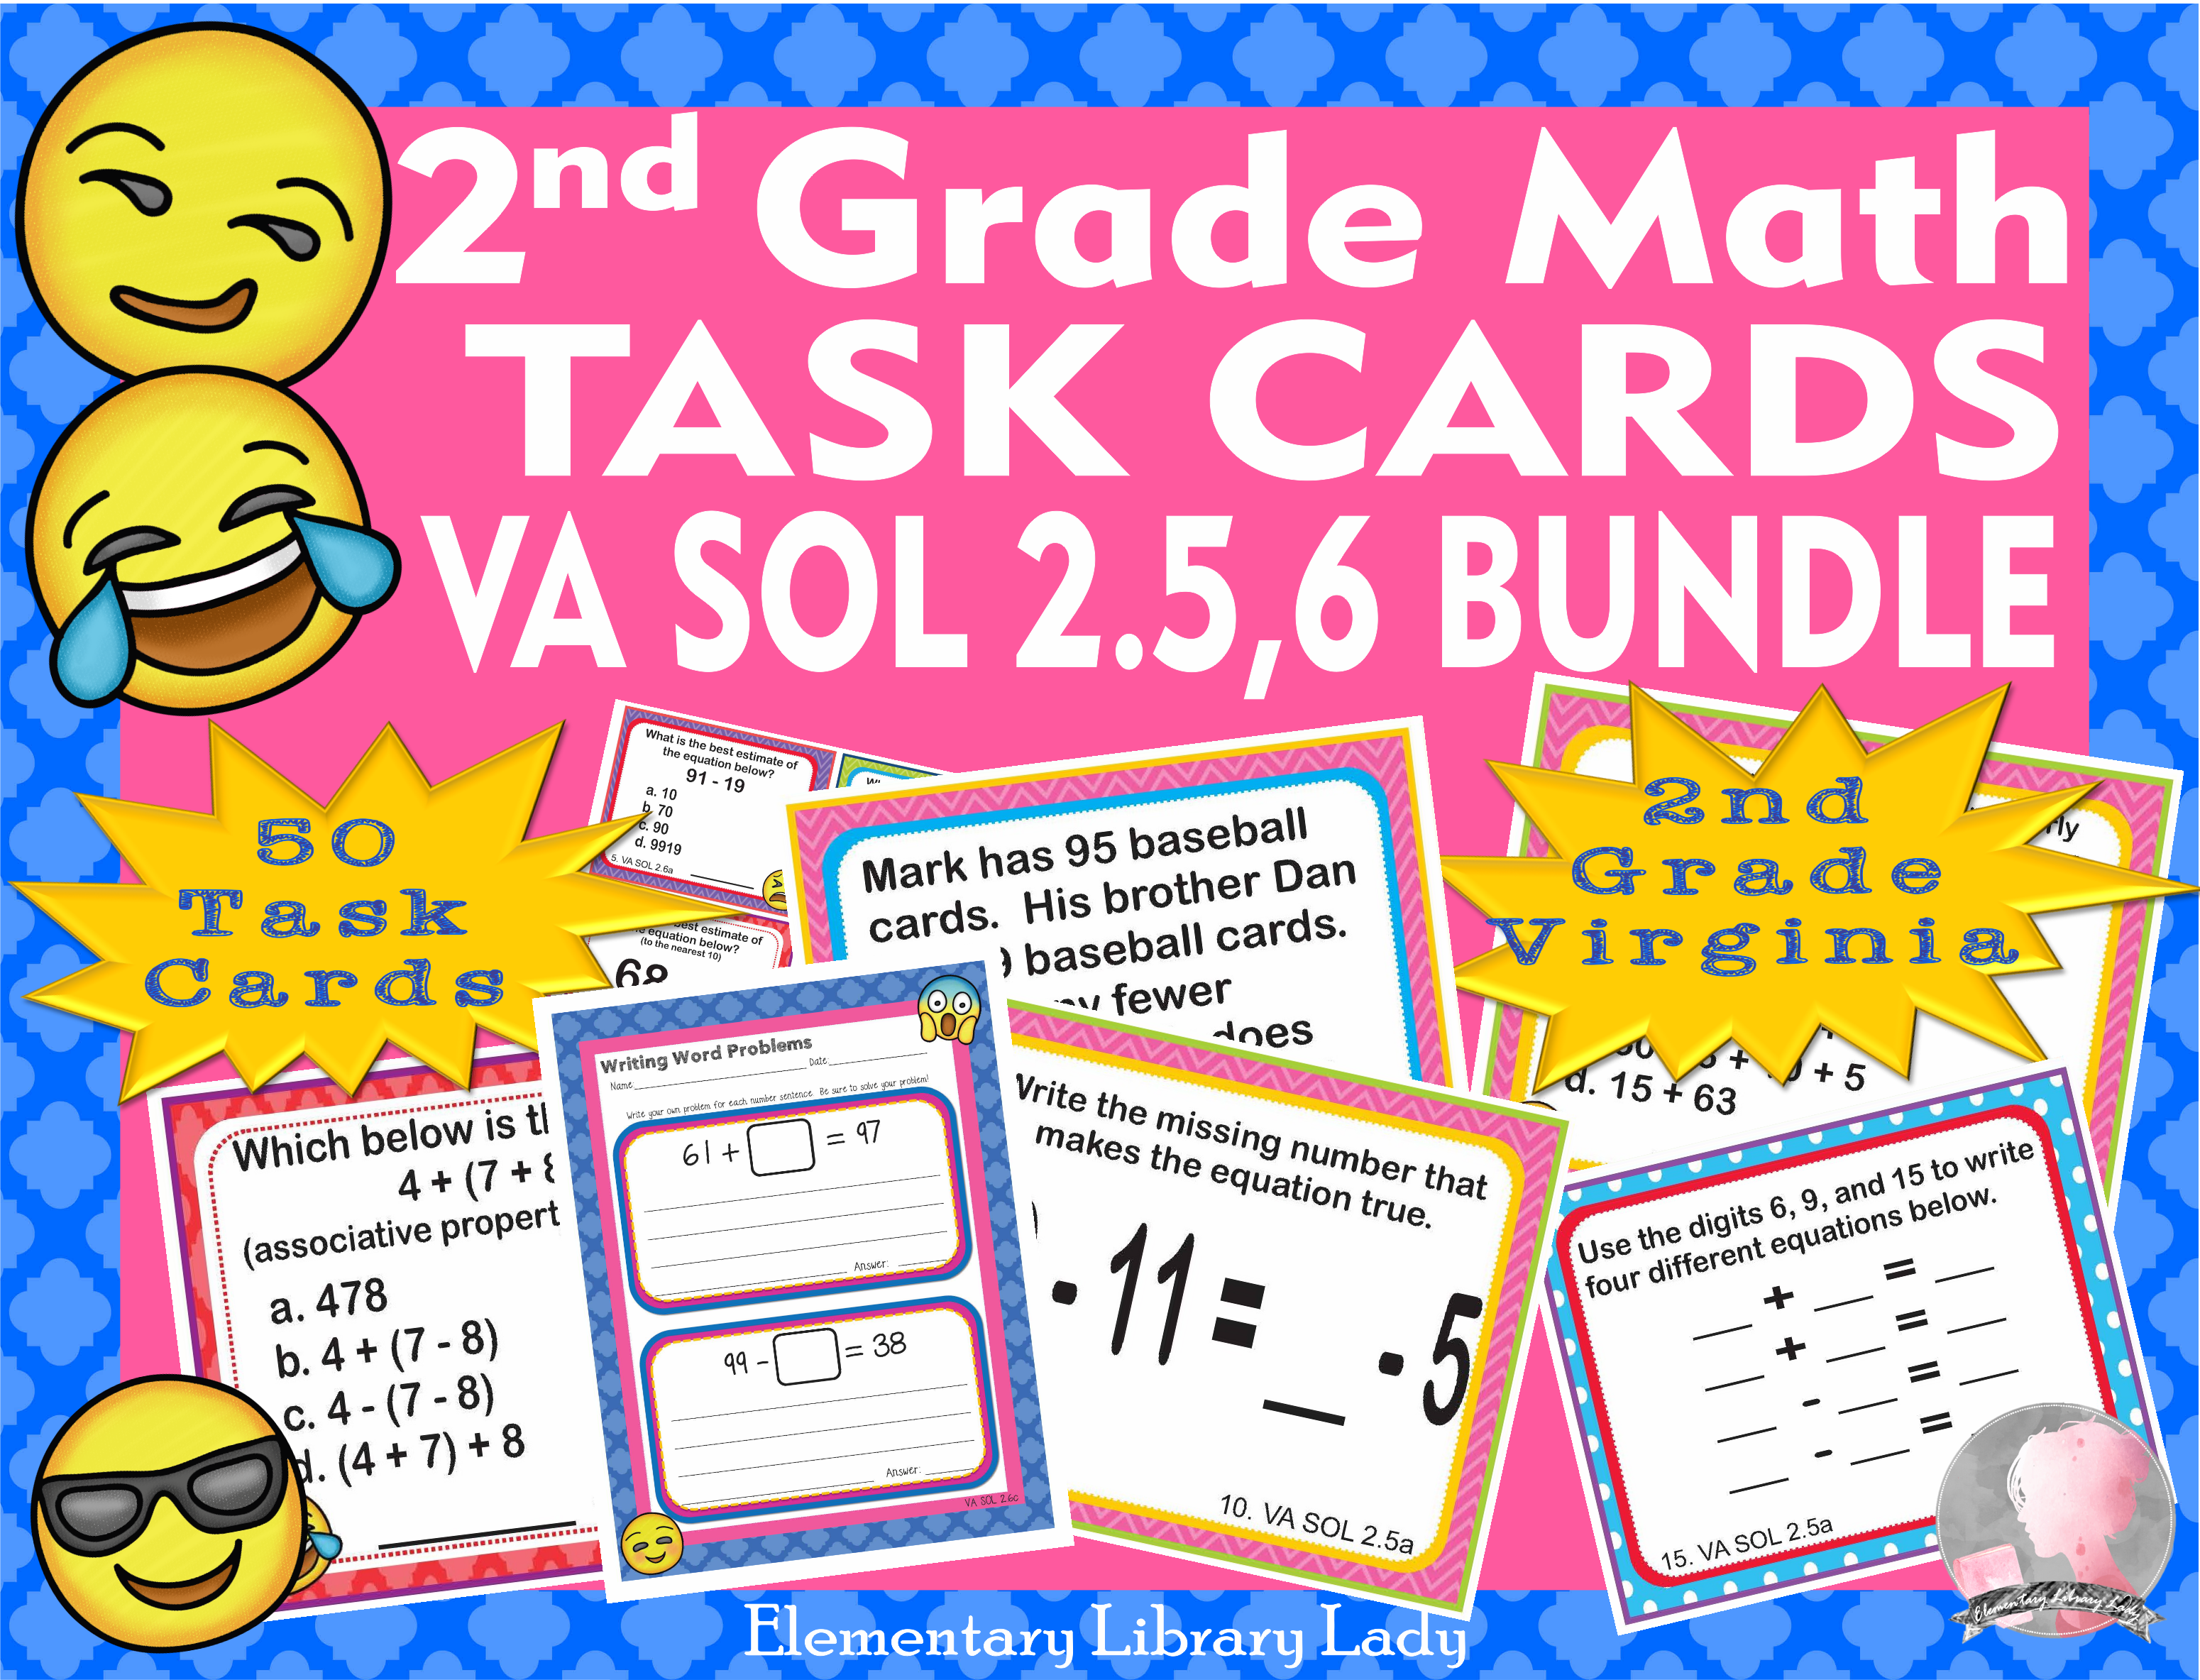 Virginia Sol Math Task Cards Bundle Computation